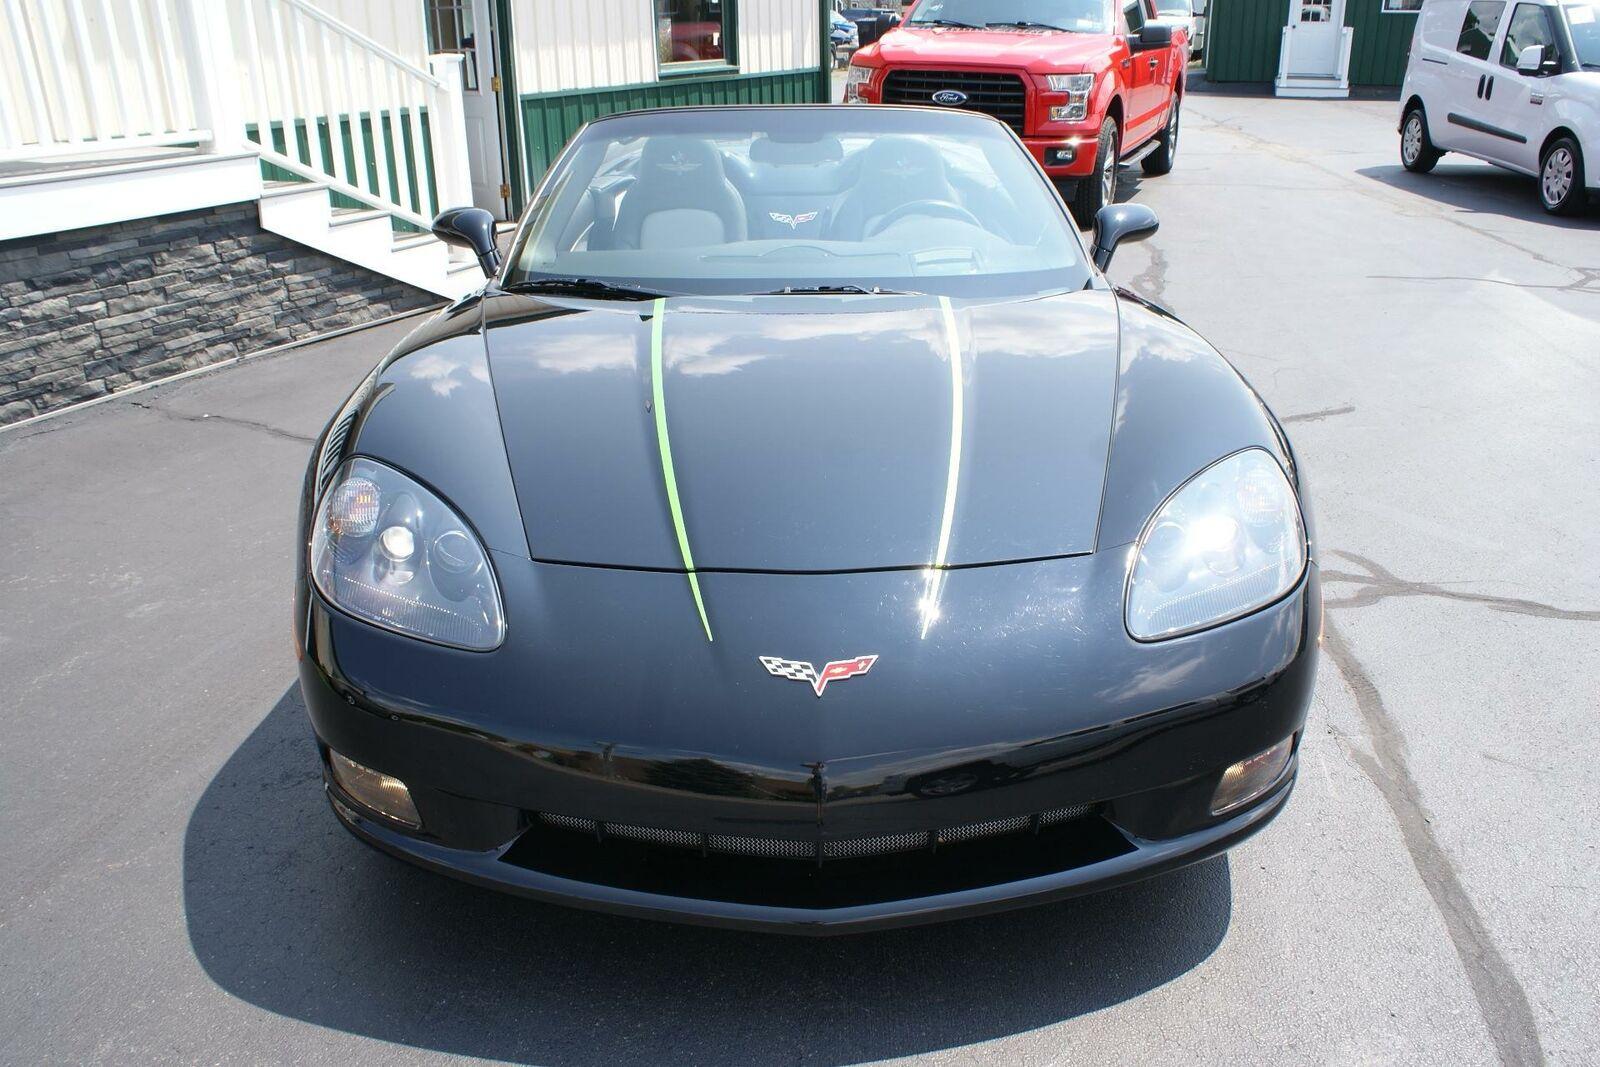 2008 Black Chevrolet Corvette   | C6 Corvette Photo 4